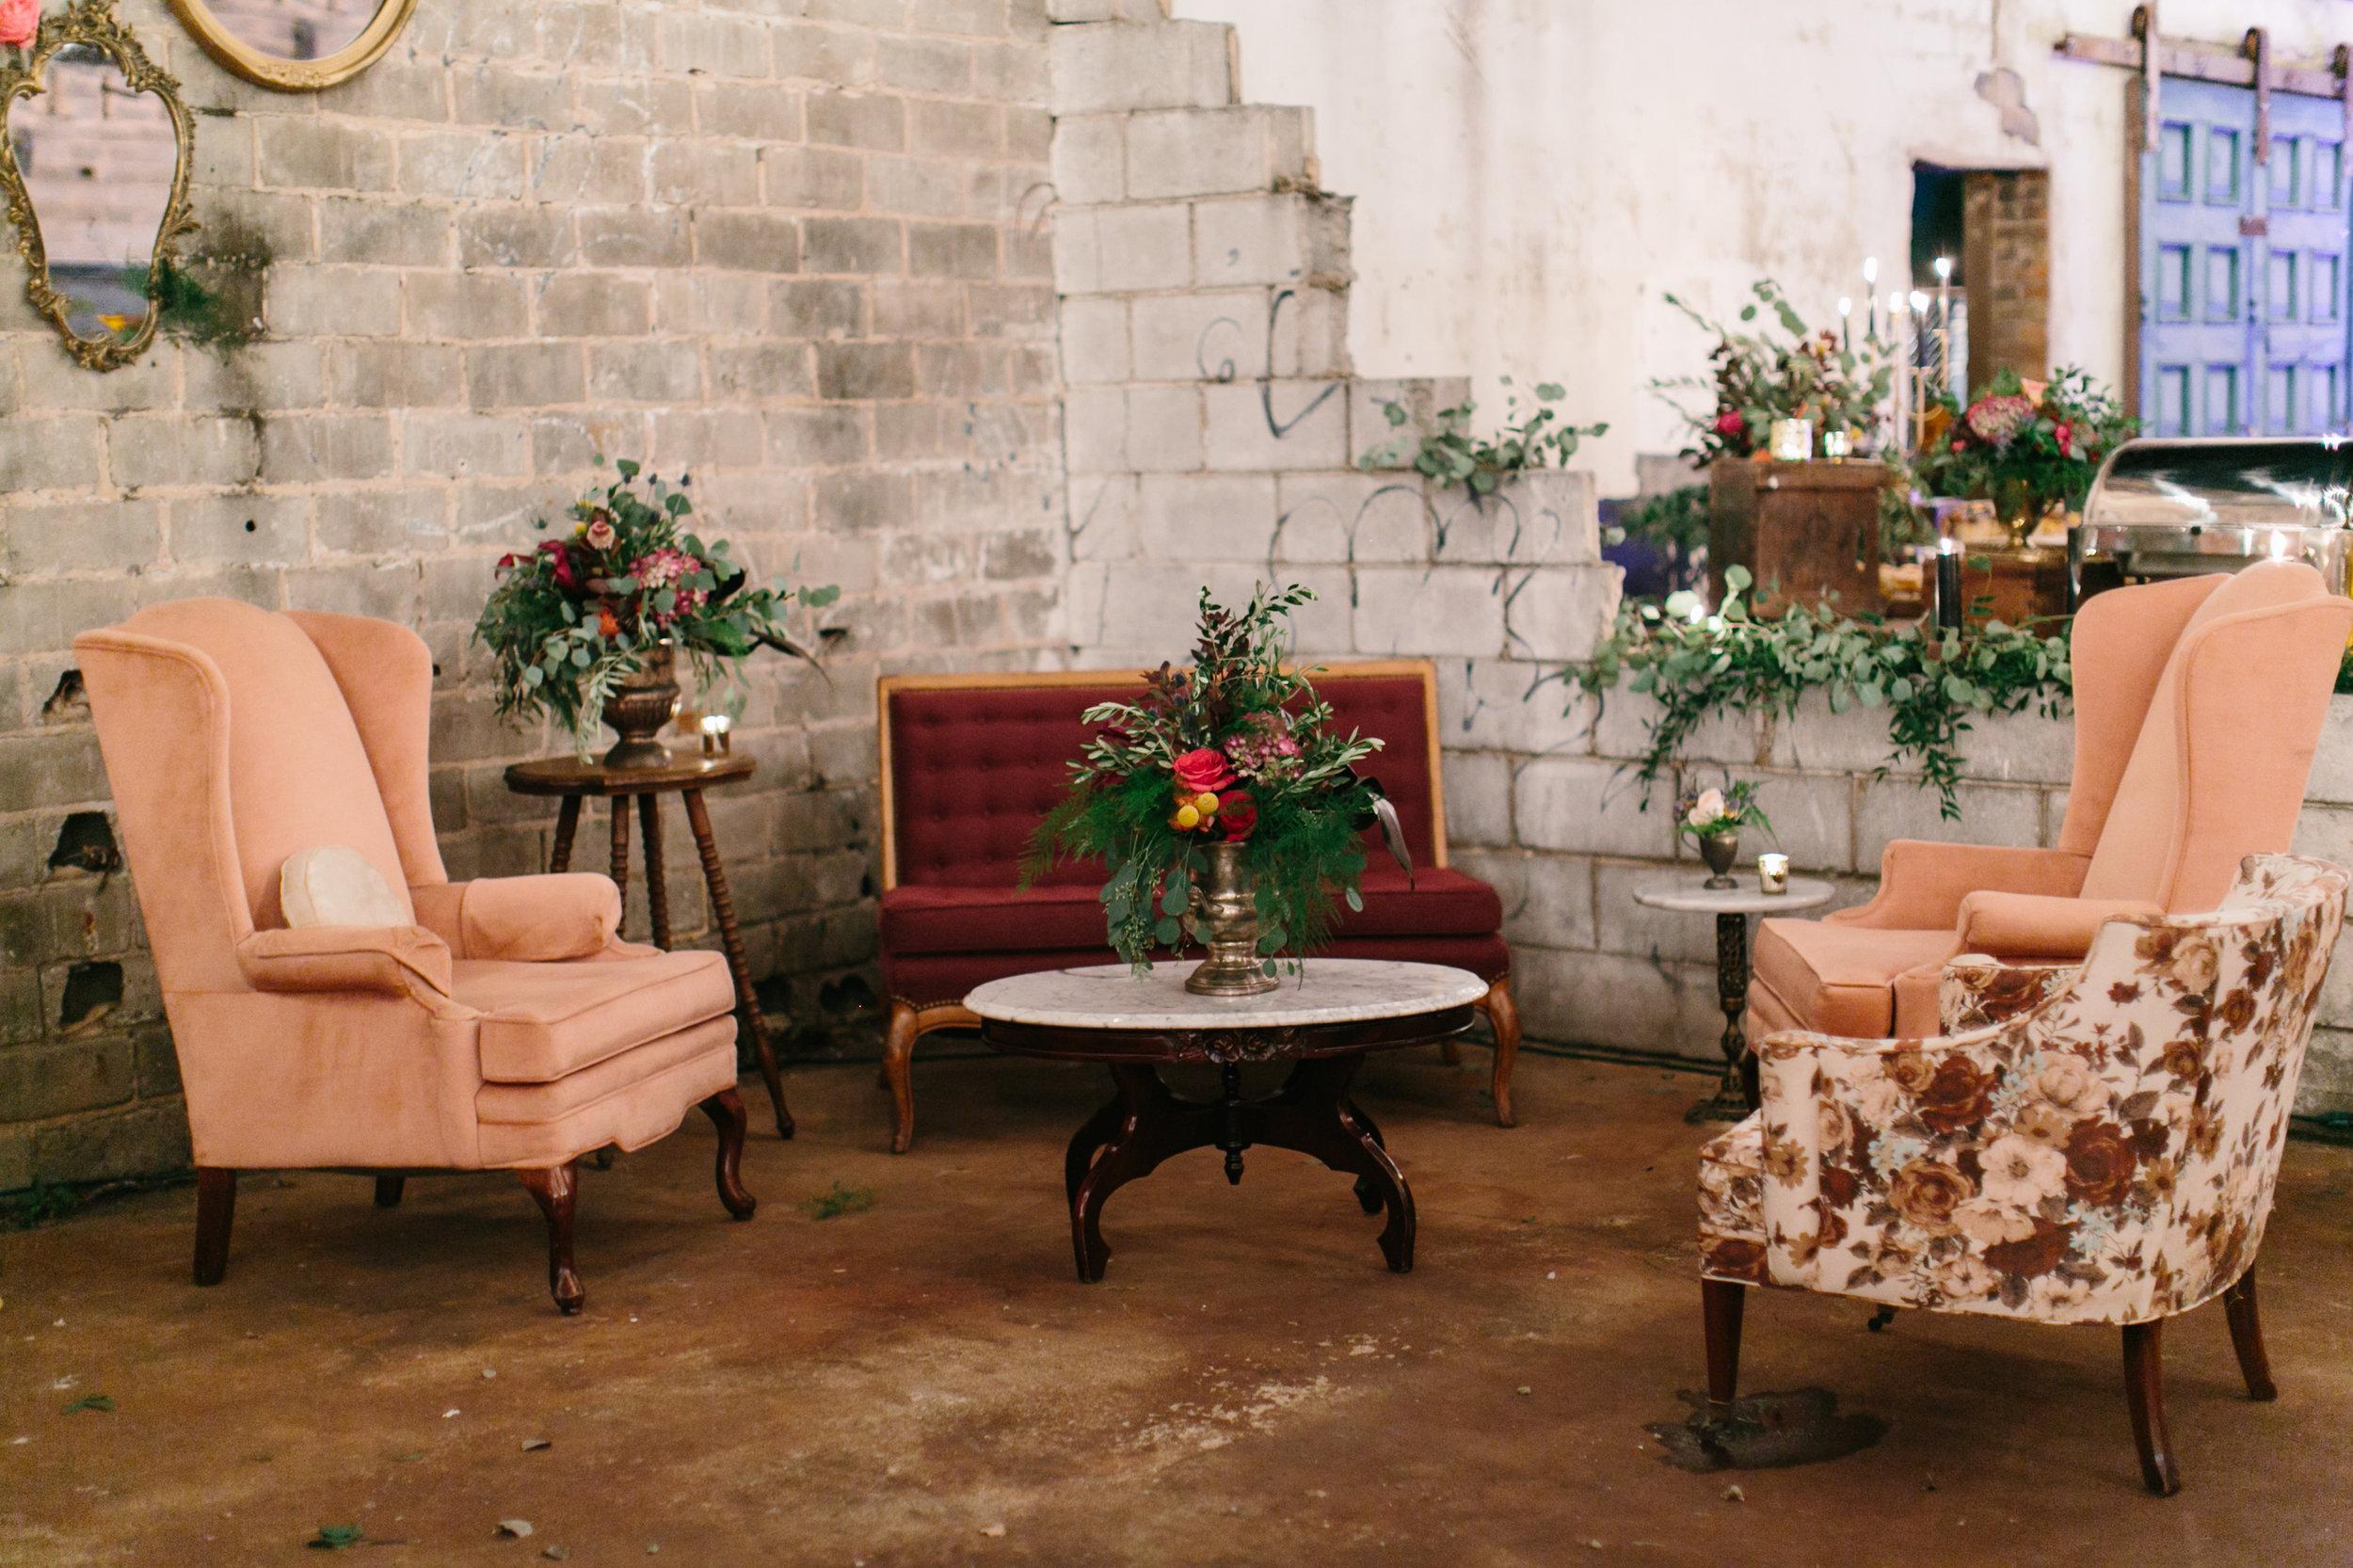 Mandi_Oliver_Chattanooga_Wedding_Abigail_Malone_Photography_Film-772.jpg